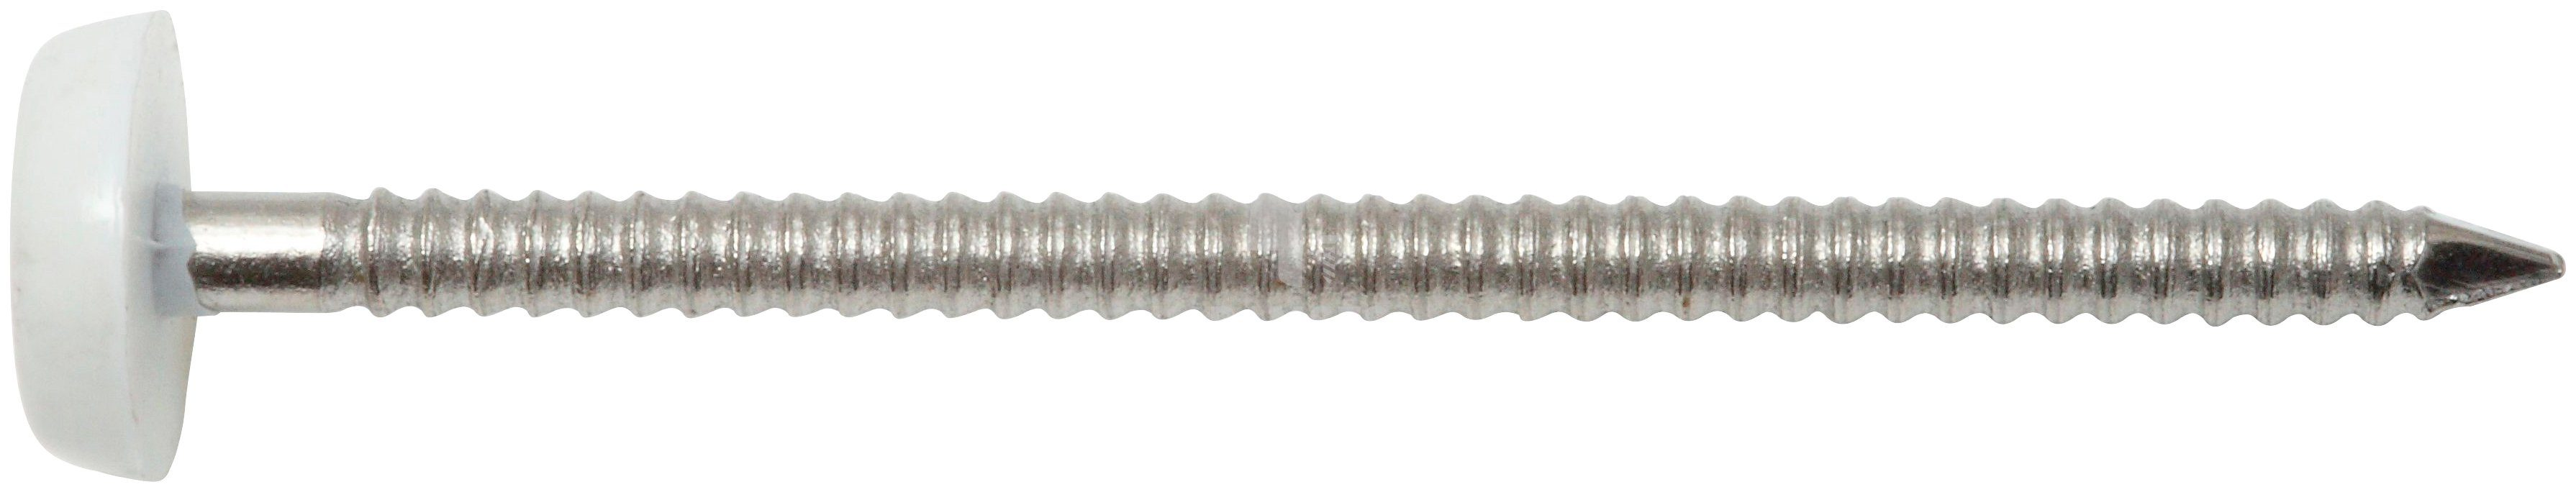 RAMSES Nagel , Edelstahlnägel mit Plastikkopf 2 x 30 mm, 250 Stk.